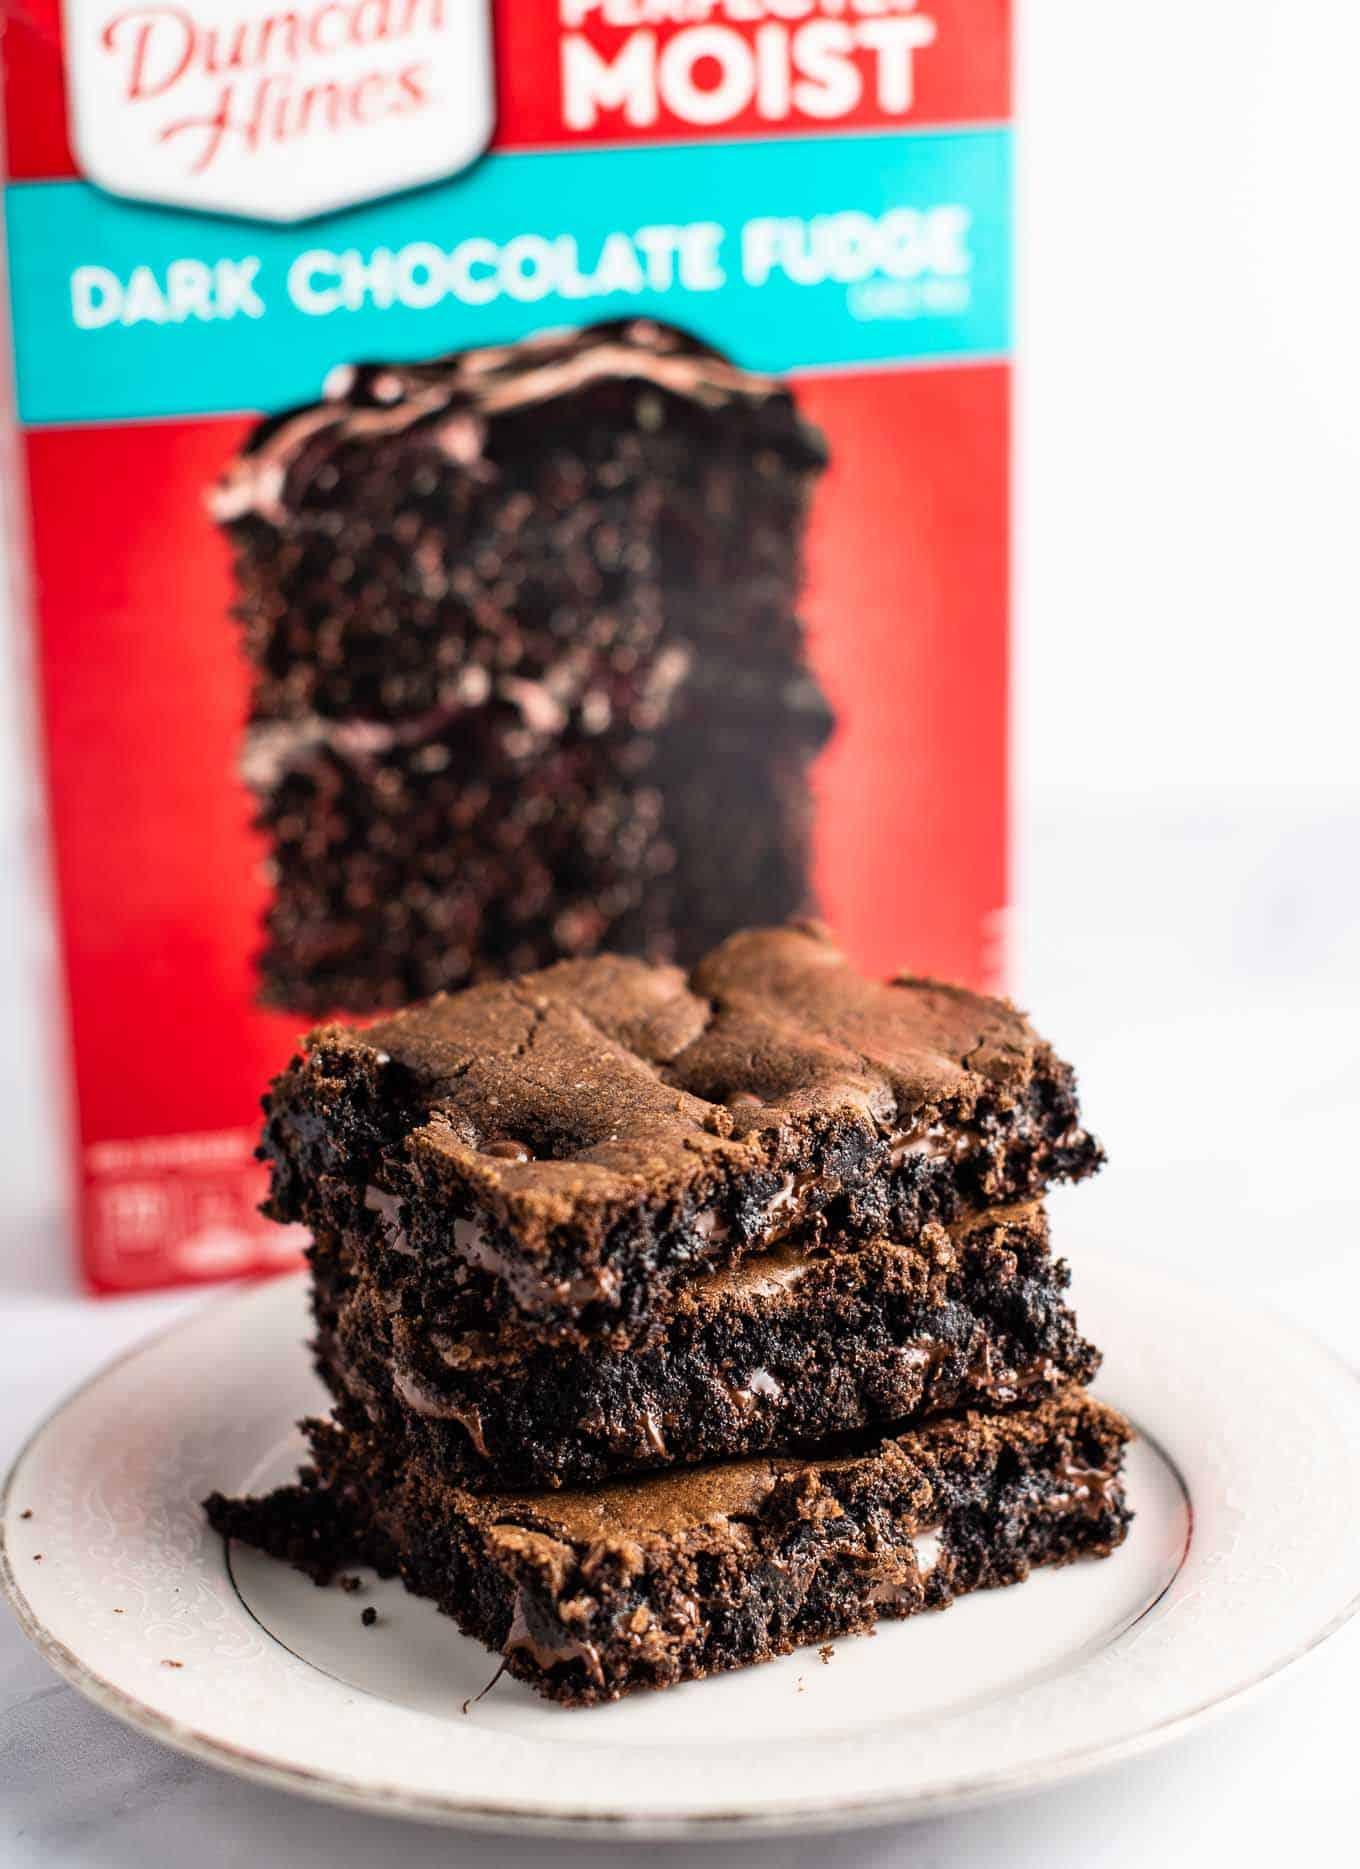 brownies made of cake mix